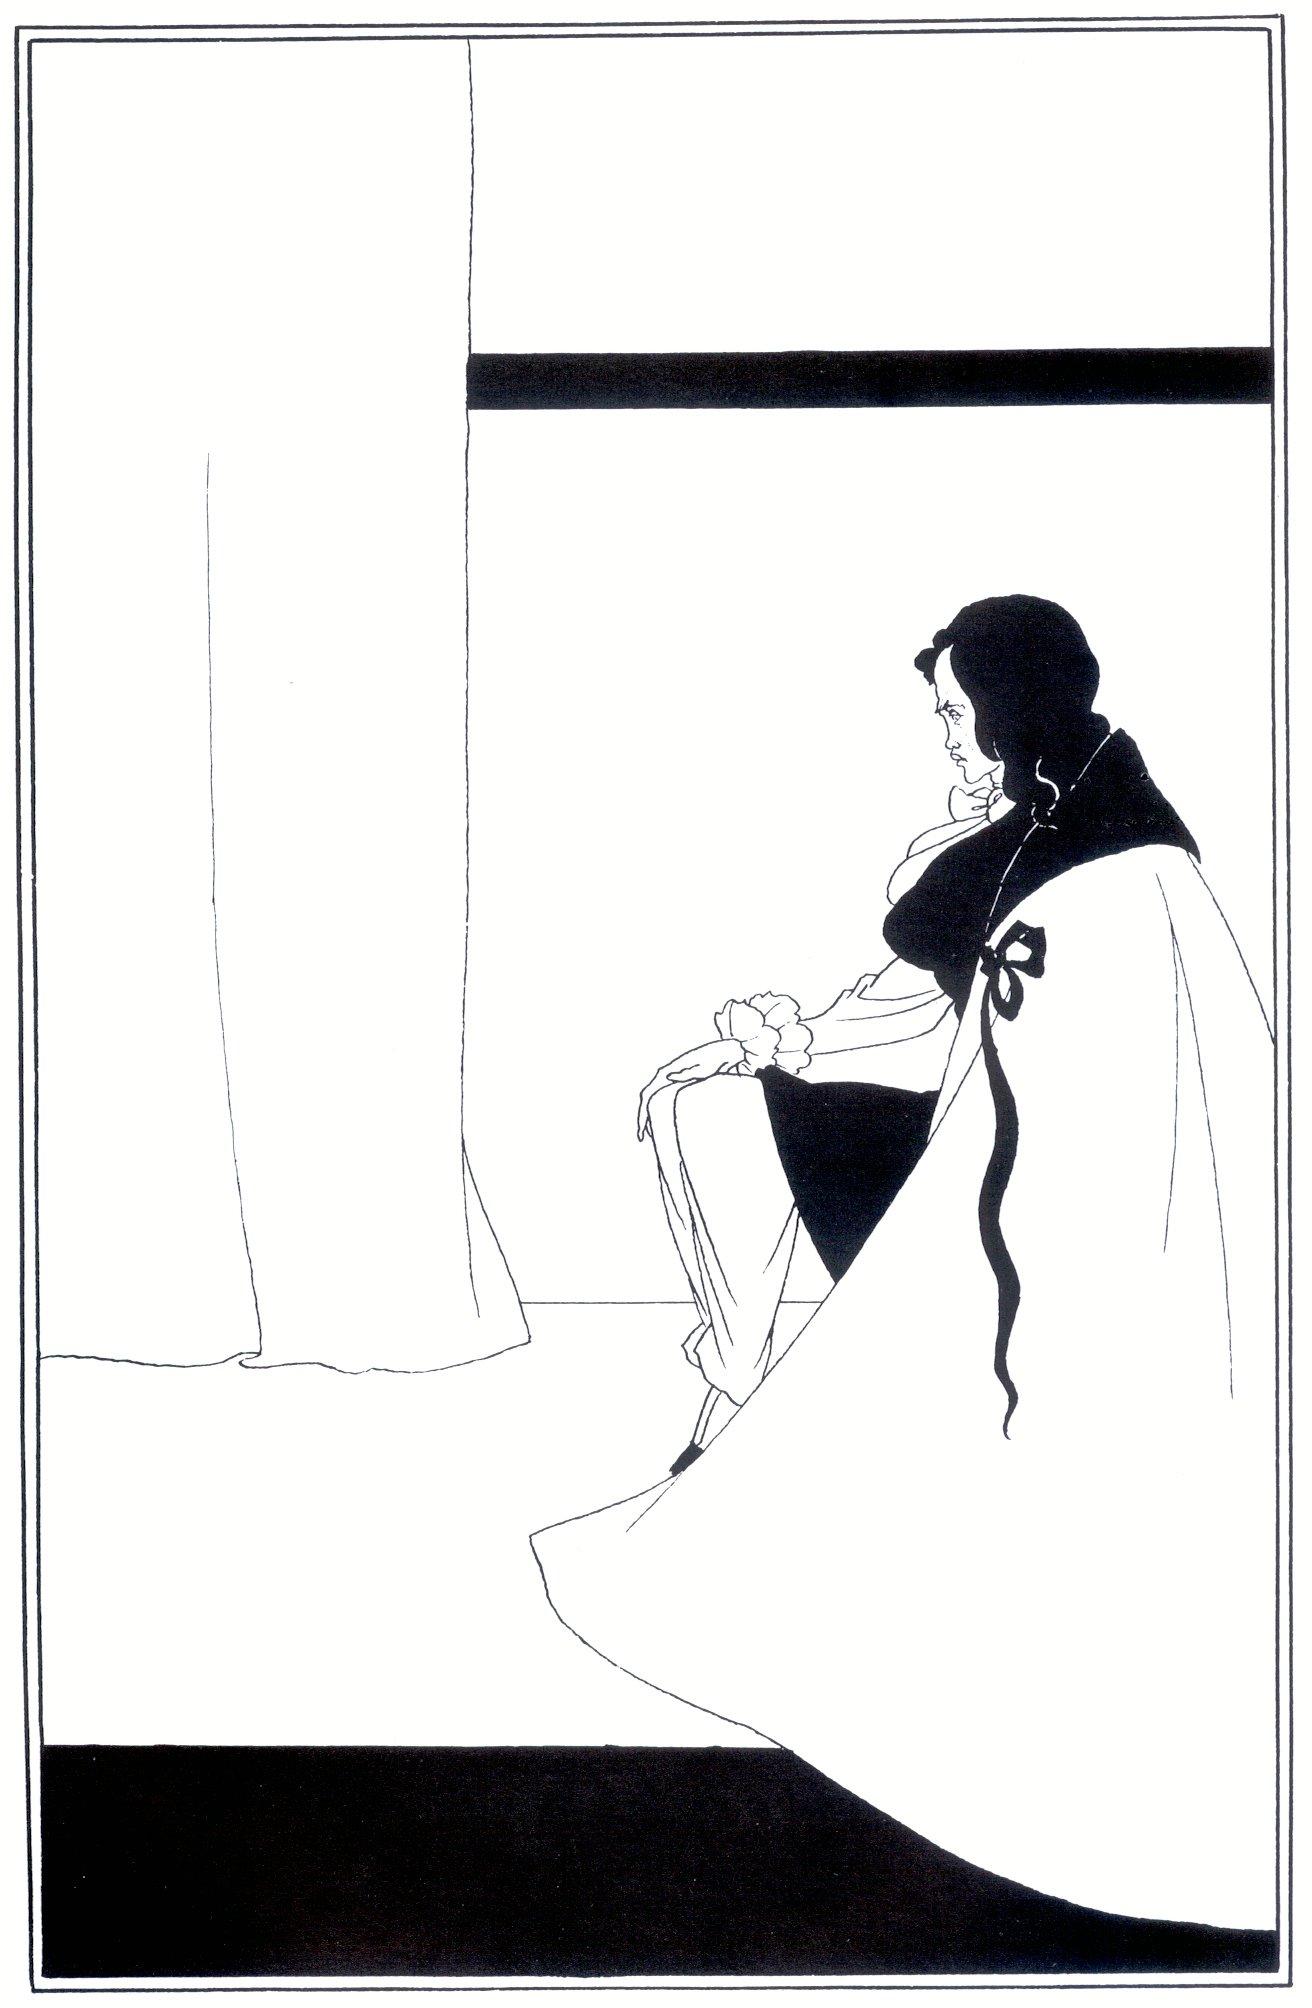 Poe, Edgar Allan. The Fall of the House of Usher . Philadelphia, PA: Burton's Gentleman's Magazine, 1839.